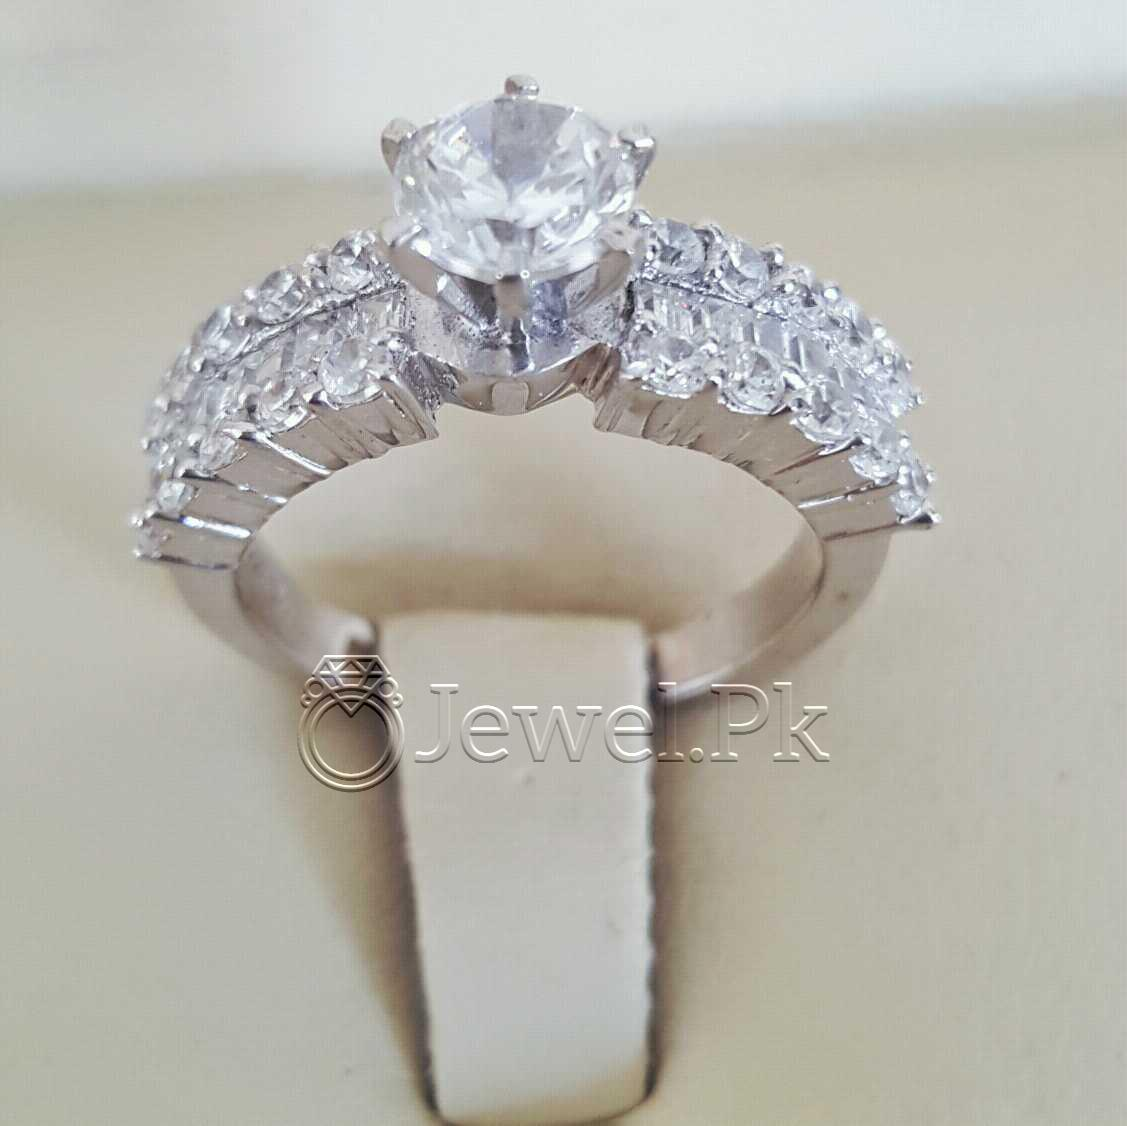 925 Silver Luxury Rings for Ladies Women Silver Rings Woman Handmade Rings 47 natural gemstones pakistan + 925 silver jewelry online